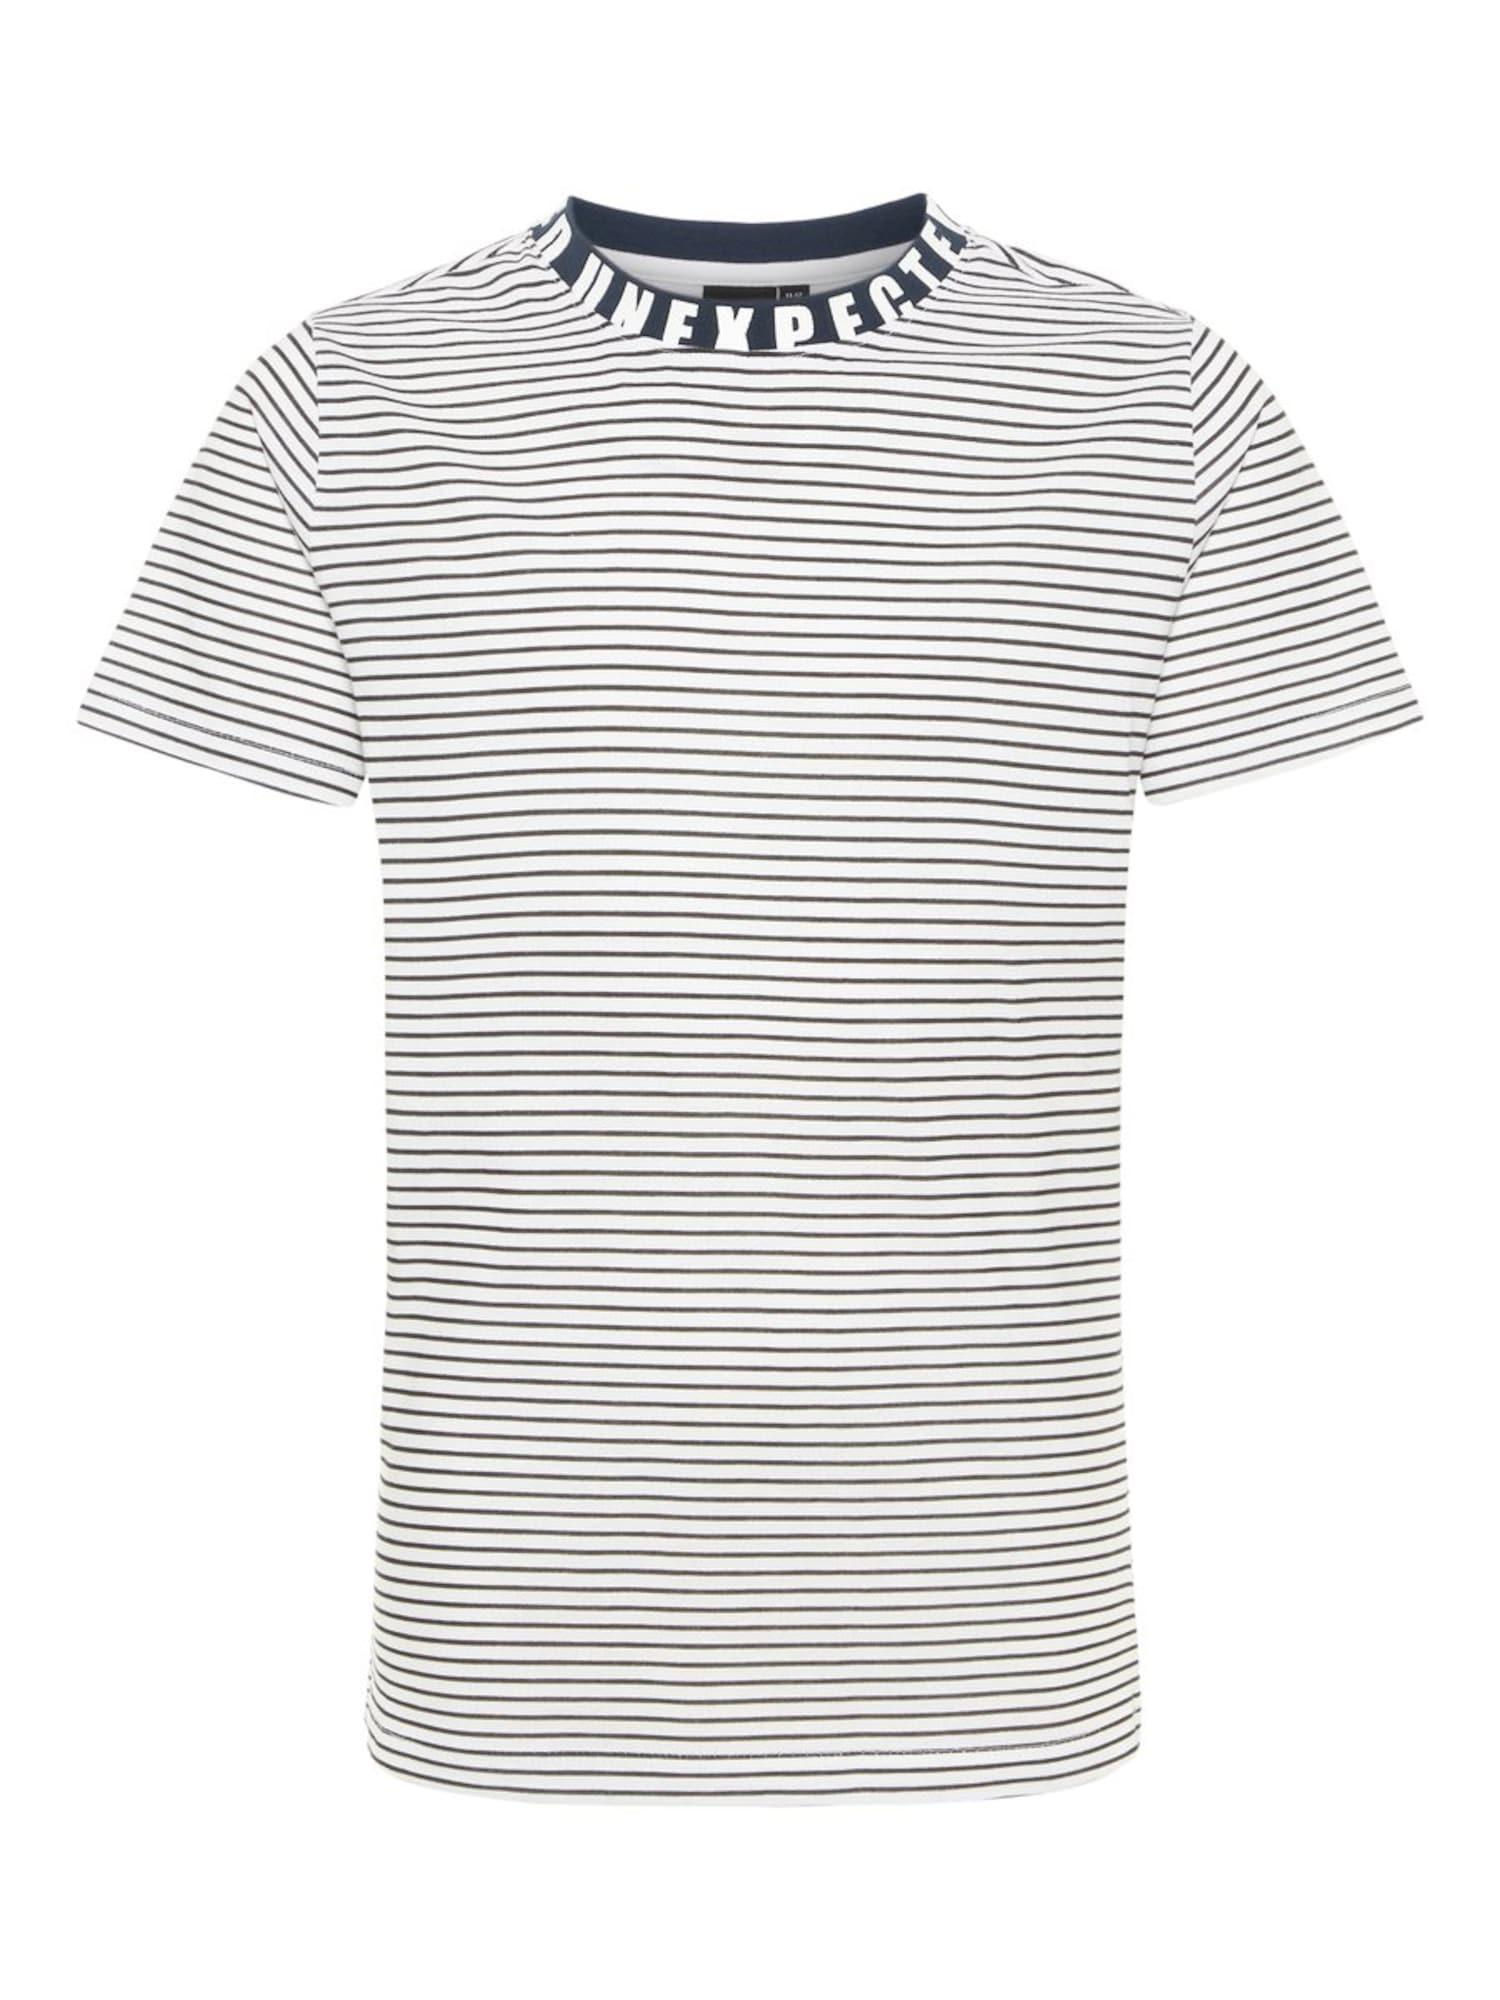 Tričko Nlmhero tmavě modrá bílá NAME IT